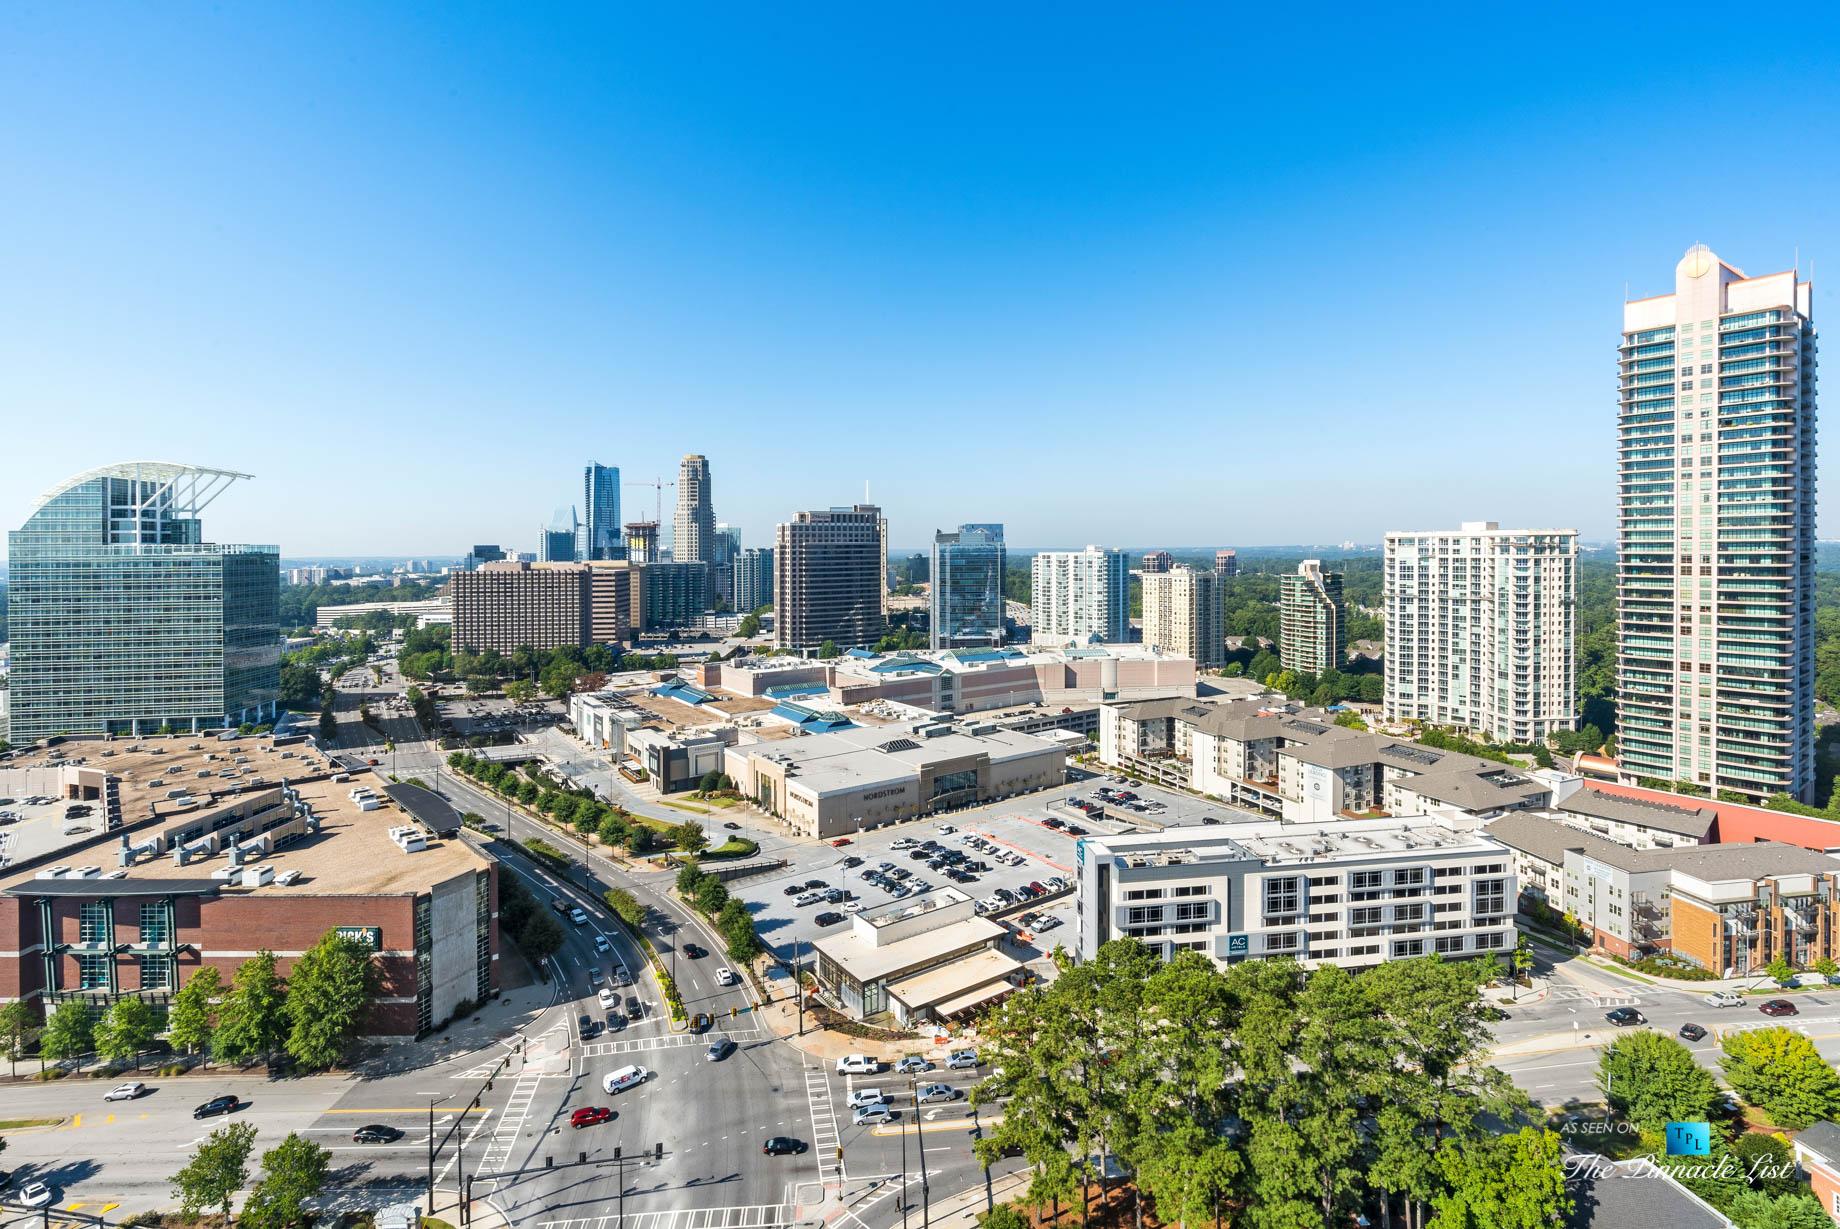 3630 Peachtree Rd NE, Unit 2808, Atlanta, GA, USA – Condo Exterior Pool Deck View – Luxury Real Estate – The Ritz-Carlton Residences Buckhead